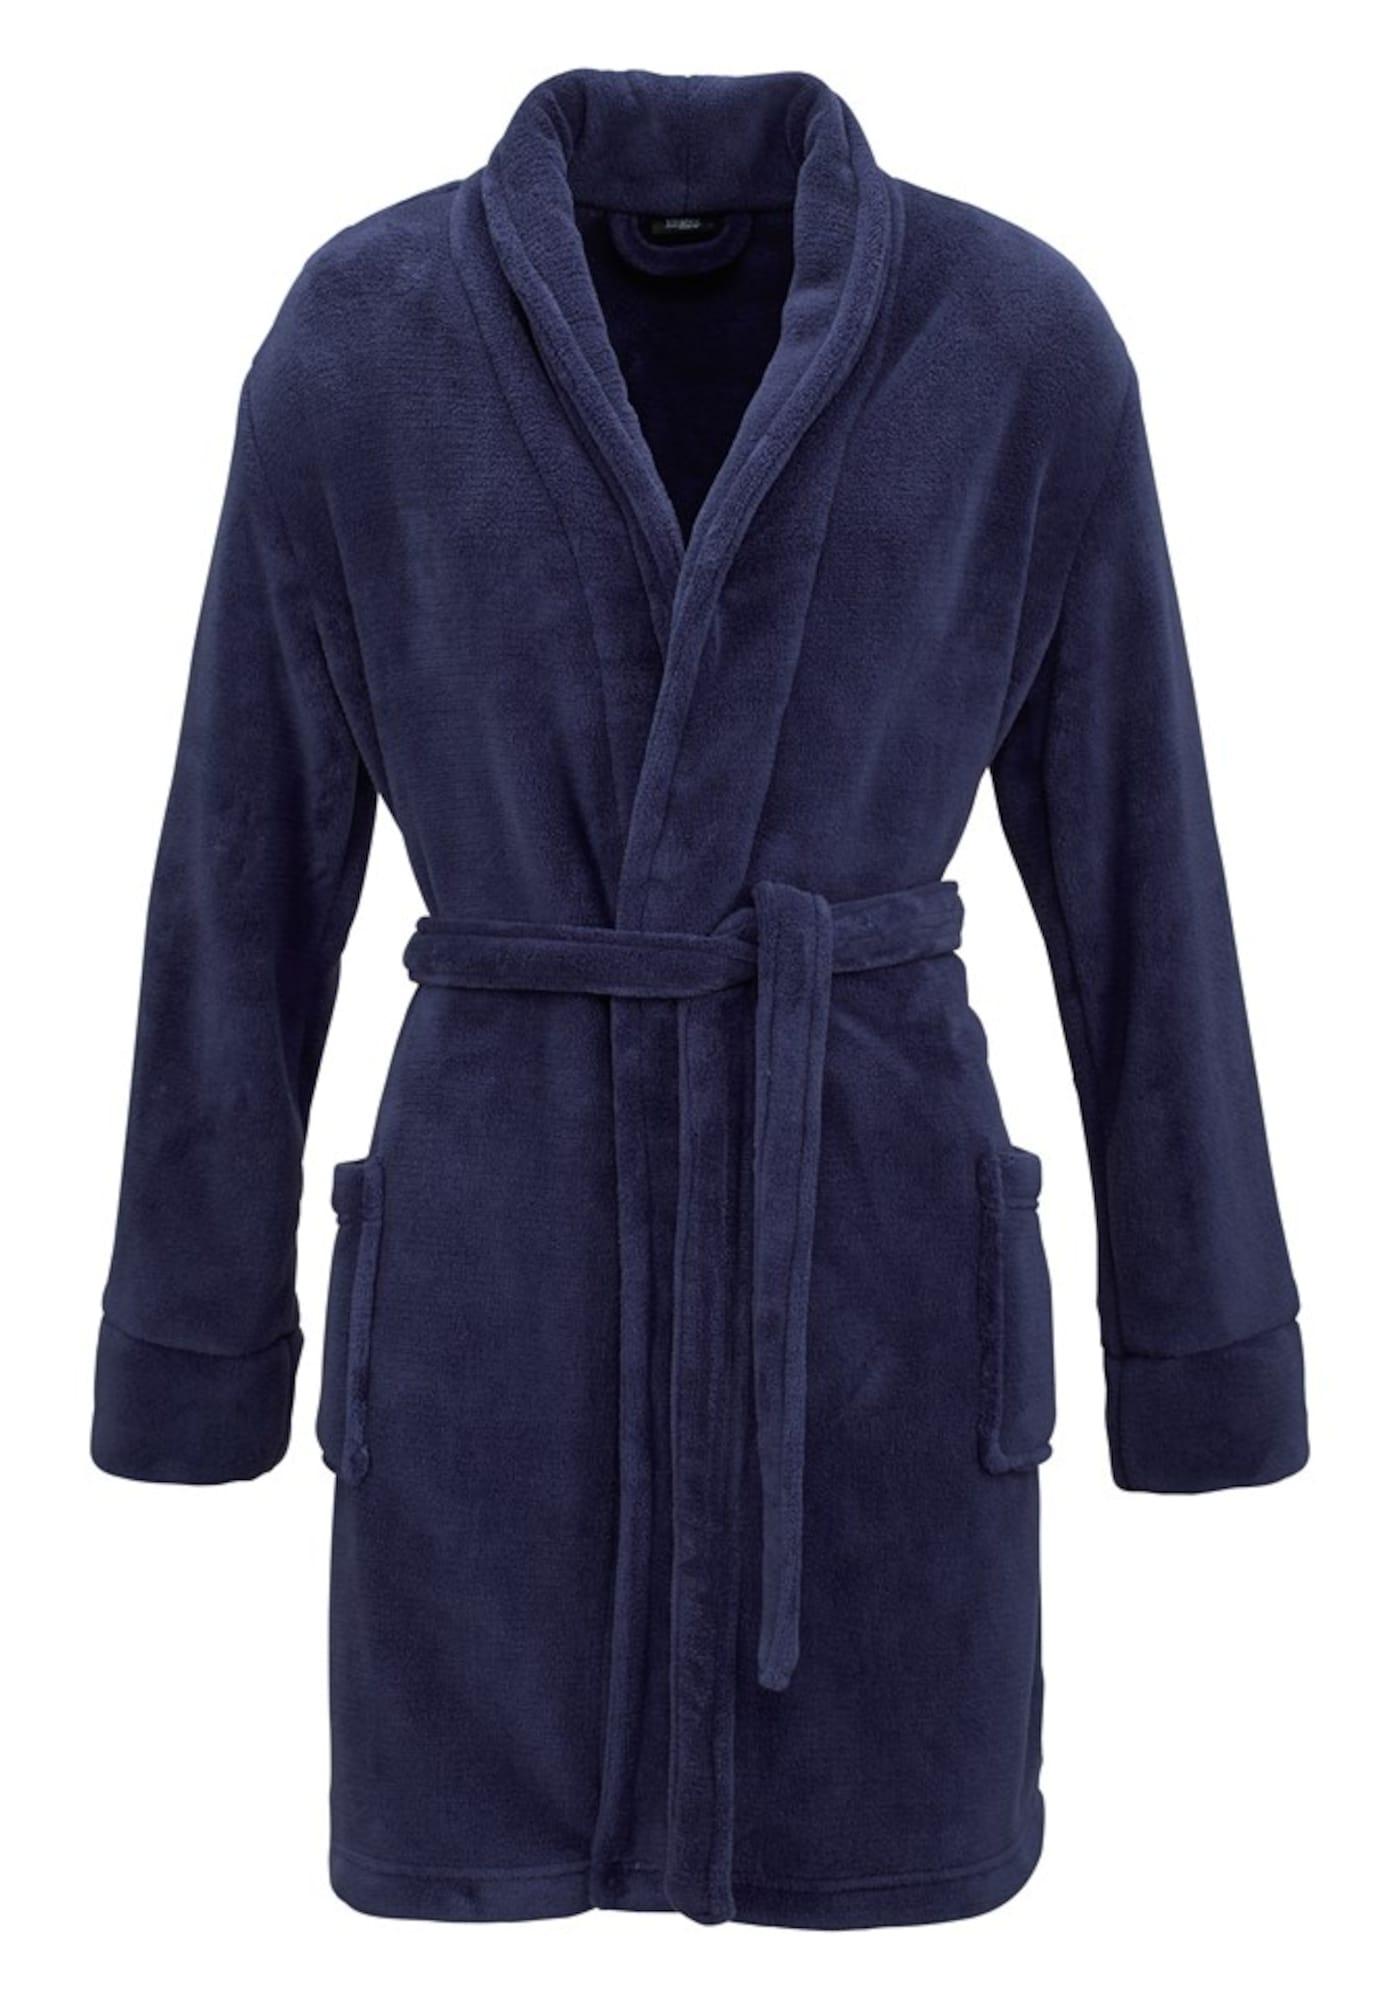 Morgenmantel | Bekleidung > Homewear > Morgenmäntel | Blau | PETITE FLEUR